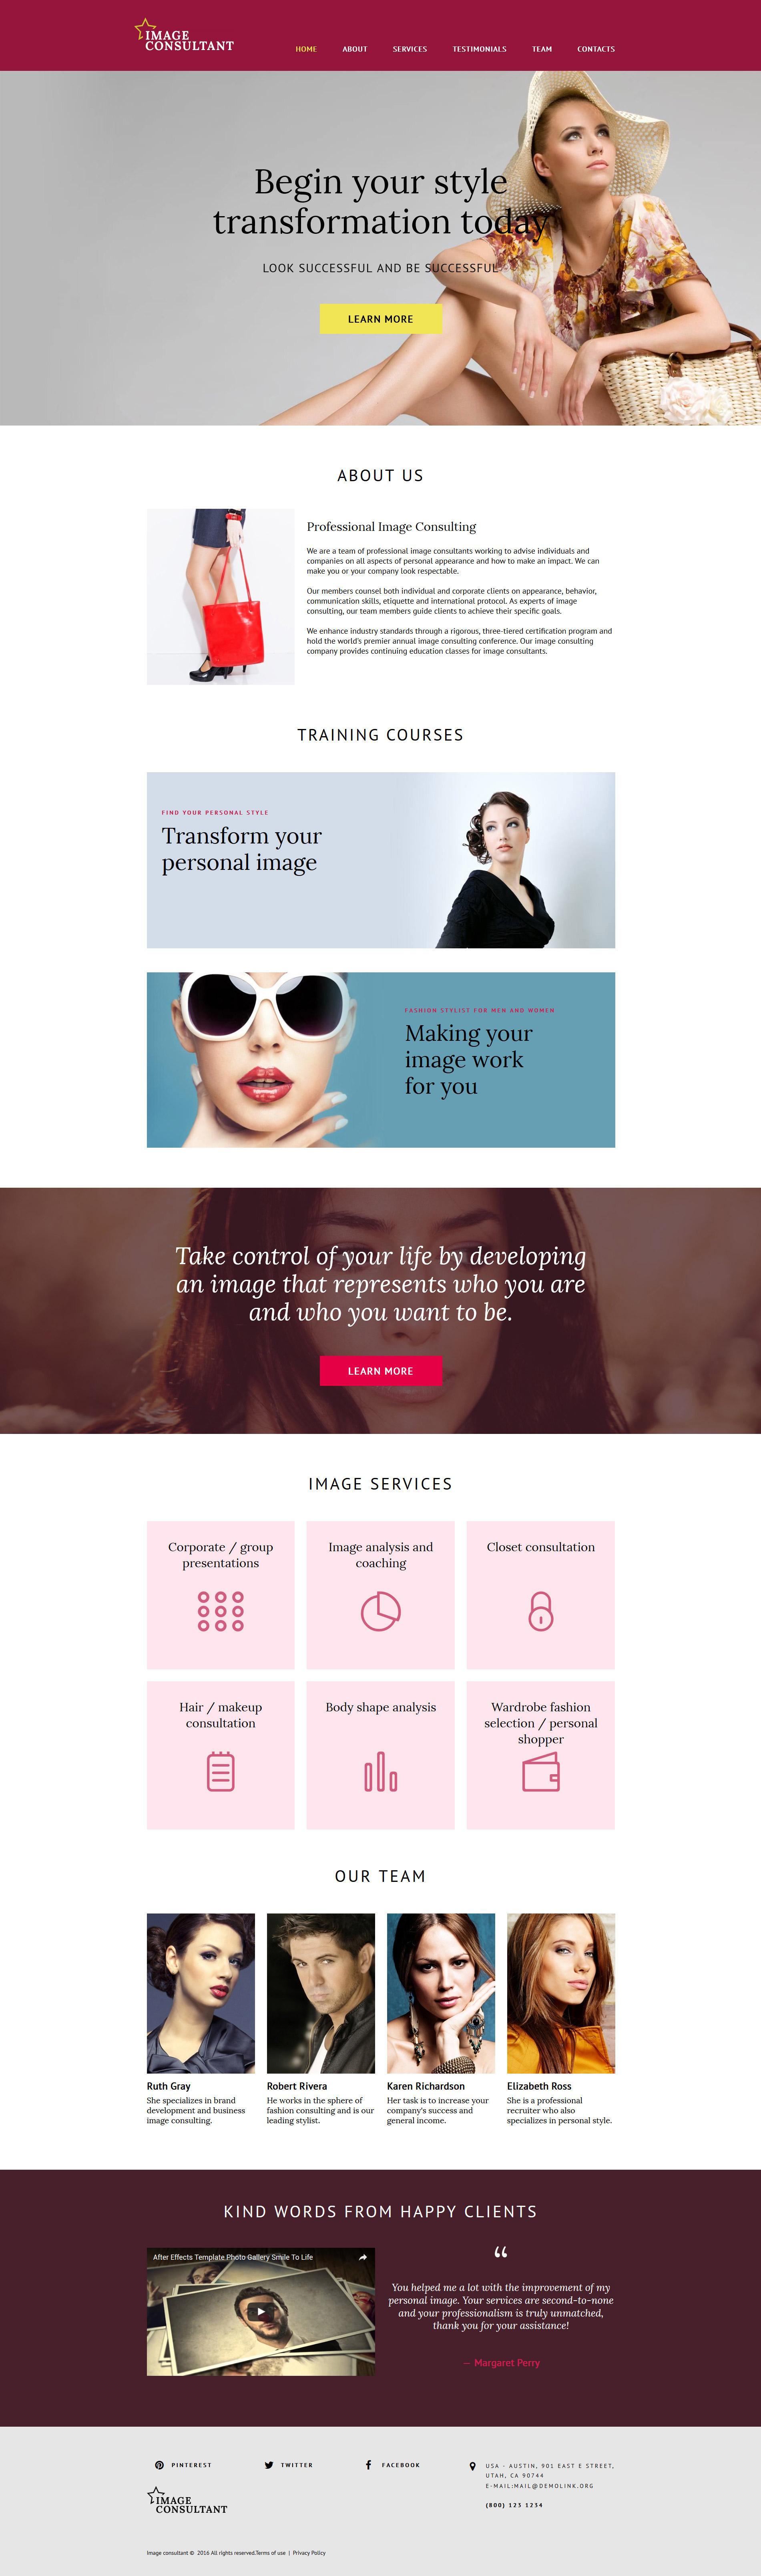 Fashion Website Templates | TemplateMonster